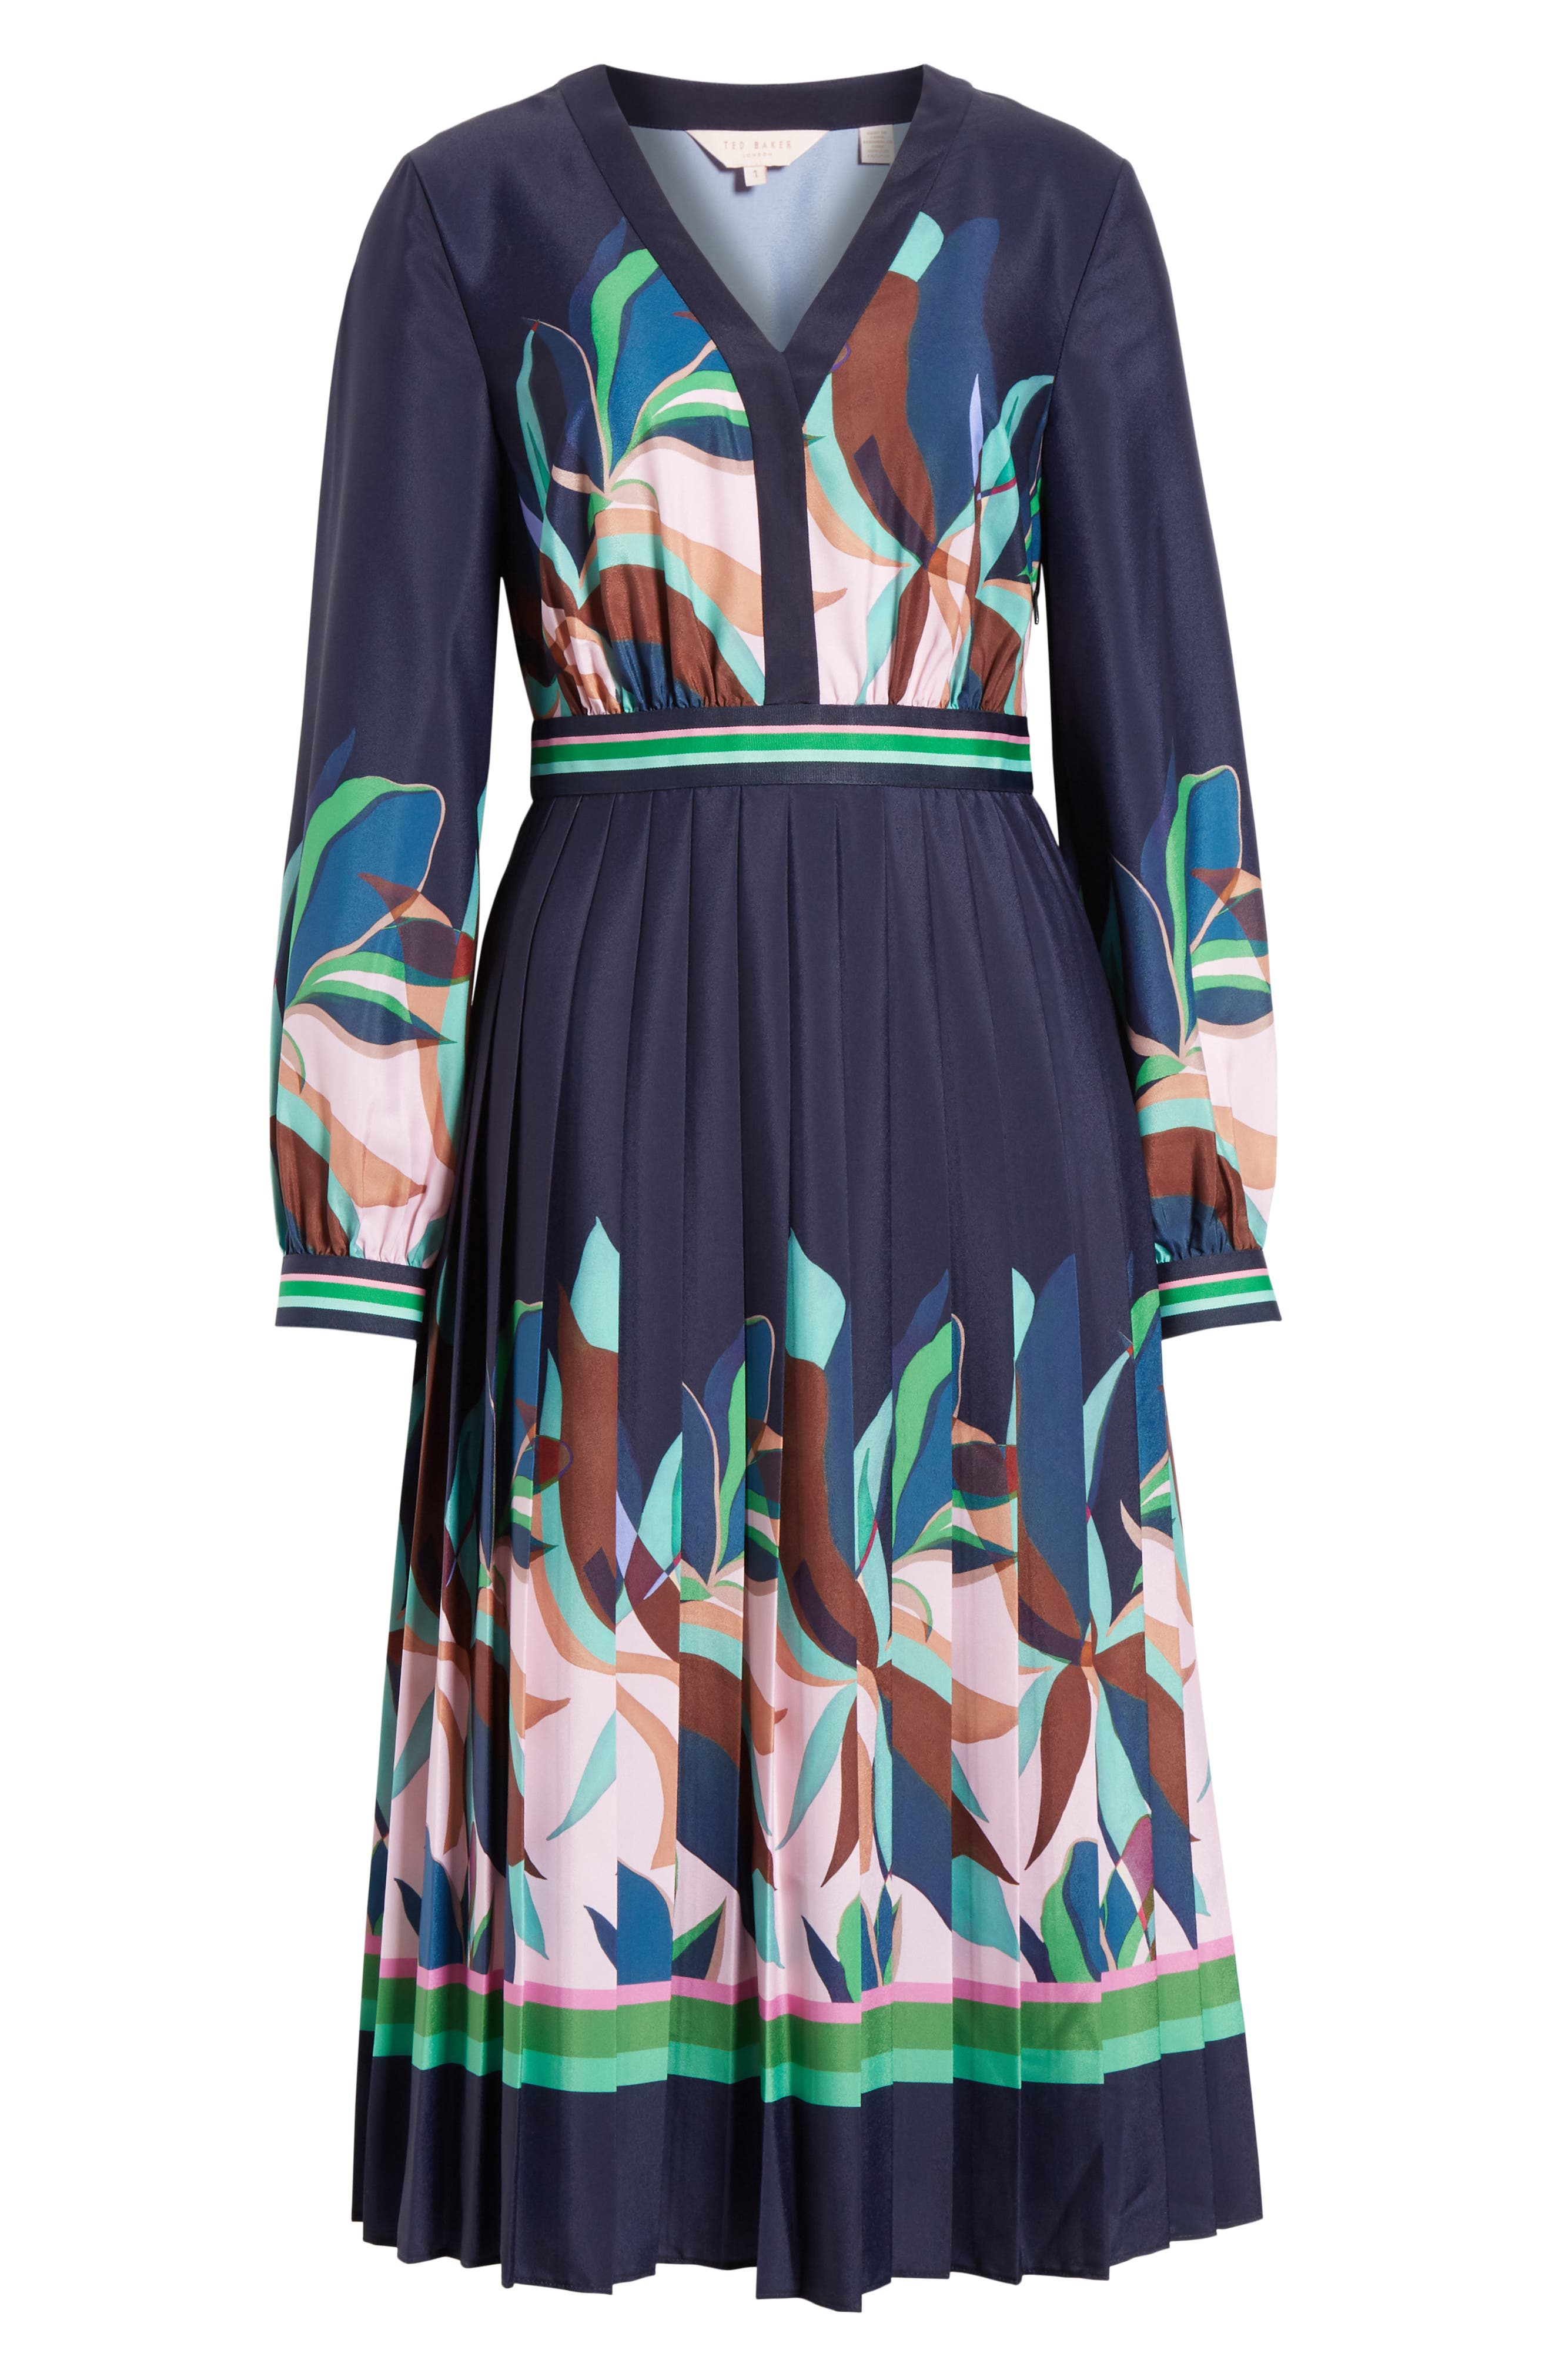 TED BAKER LONDON, Leonore Supernatural Fit & Flare Dress, Alternate thumbnail 6, color, NAVY